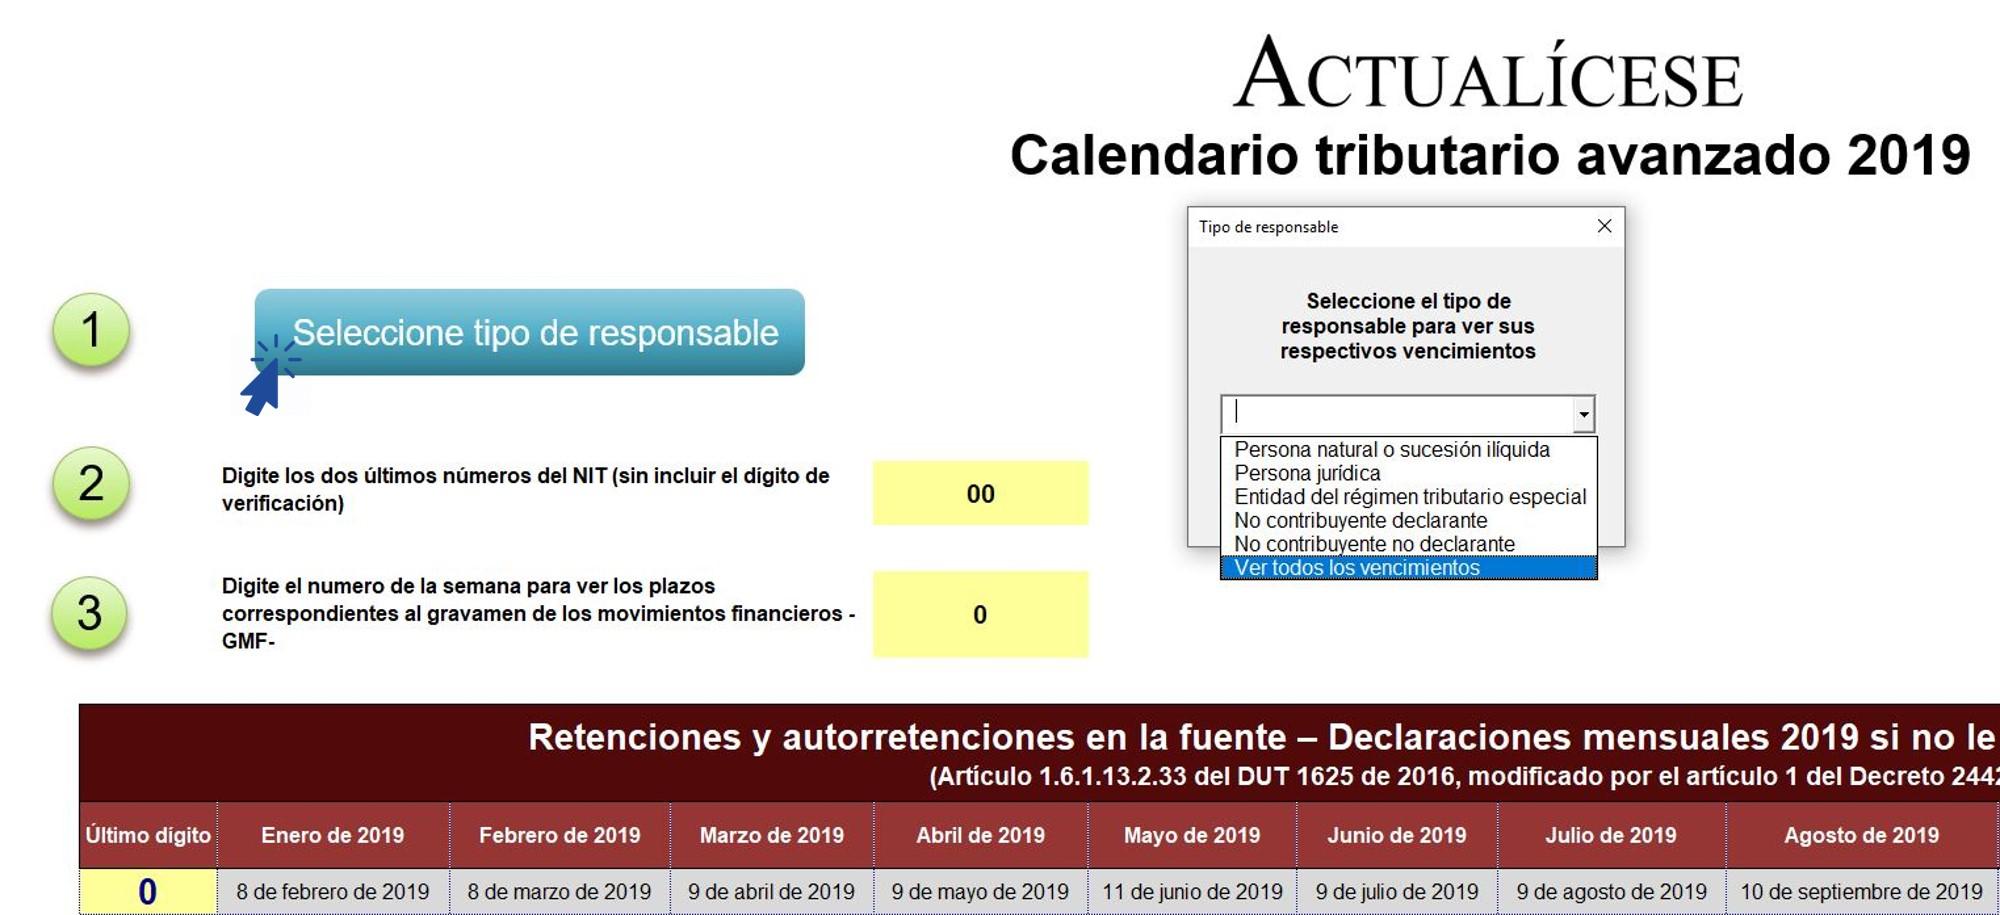 Calendario tributario 2019 avanzado